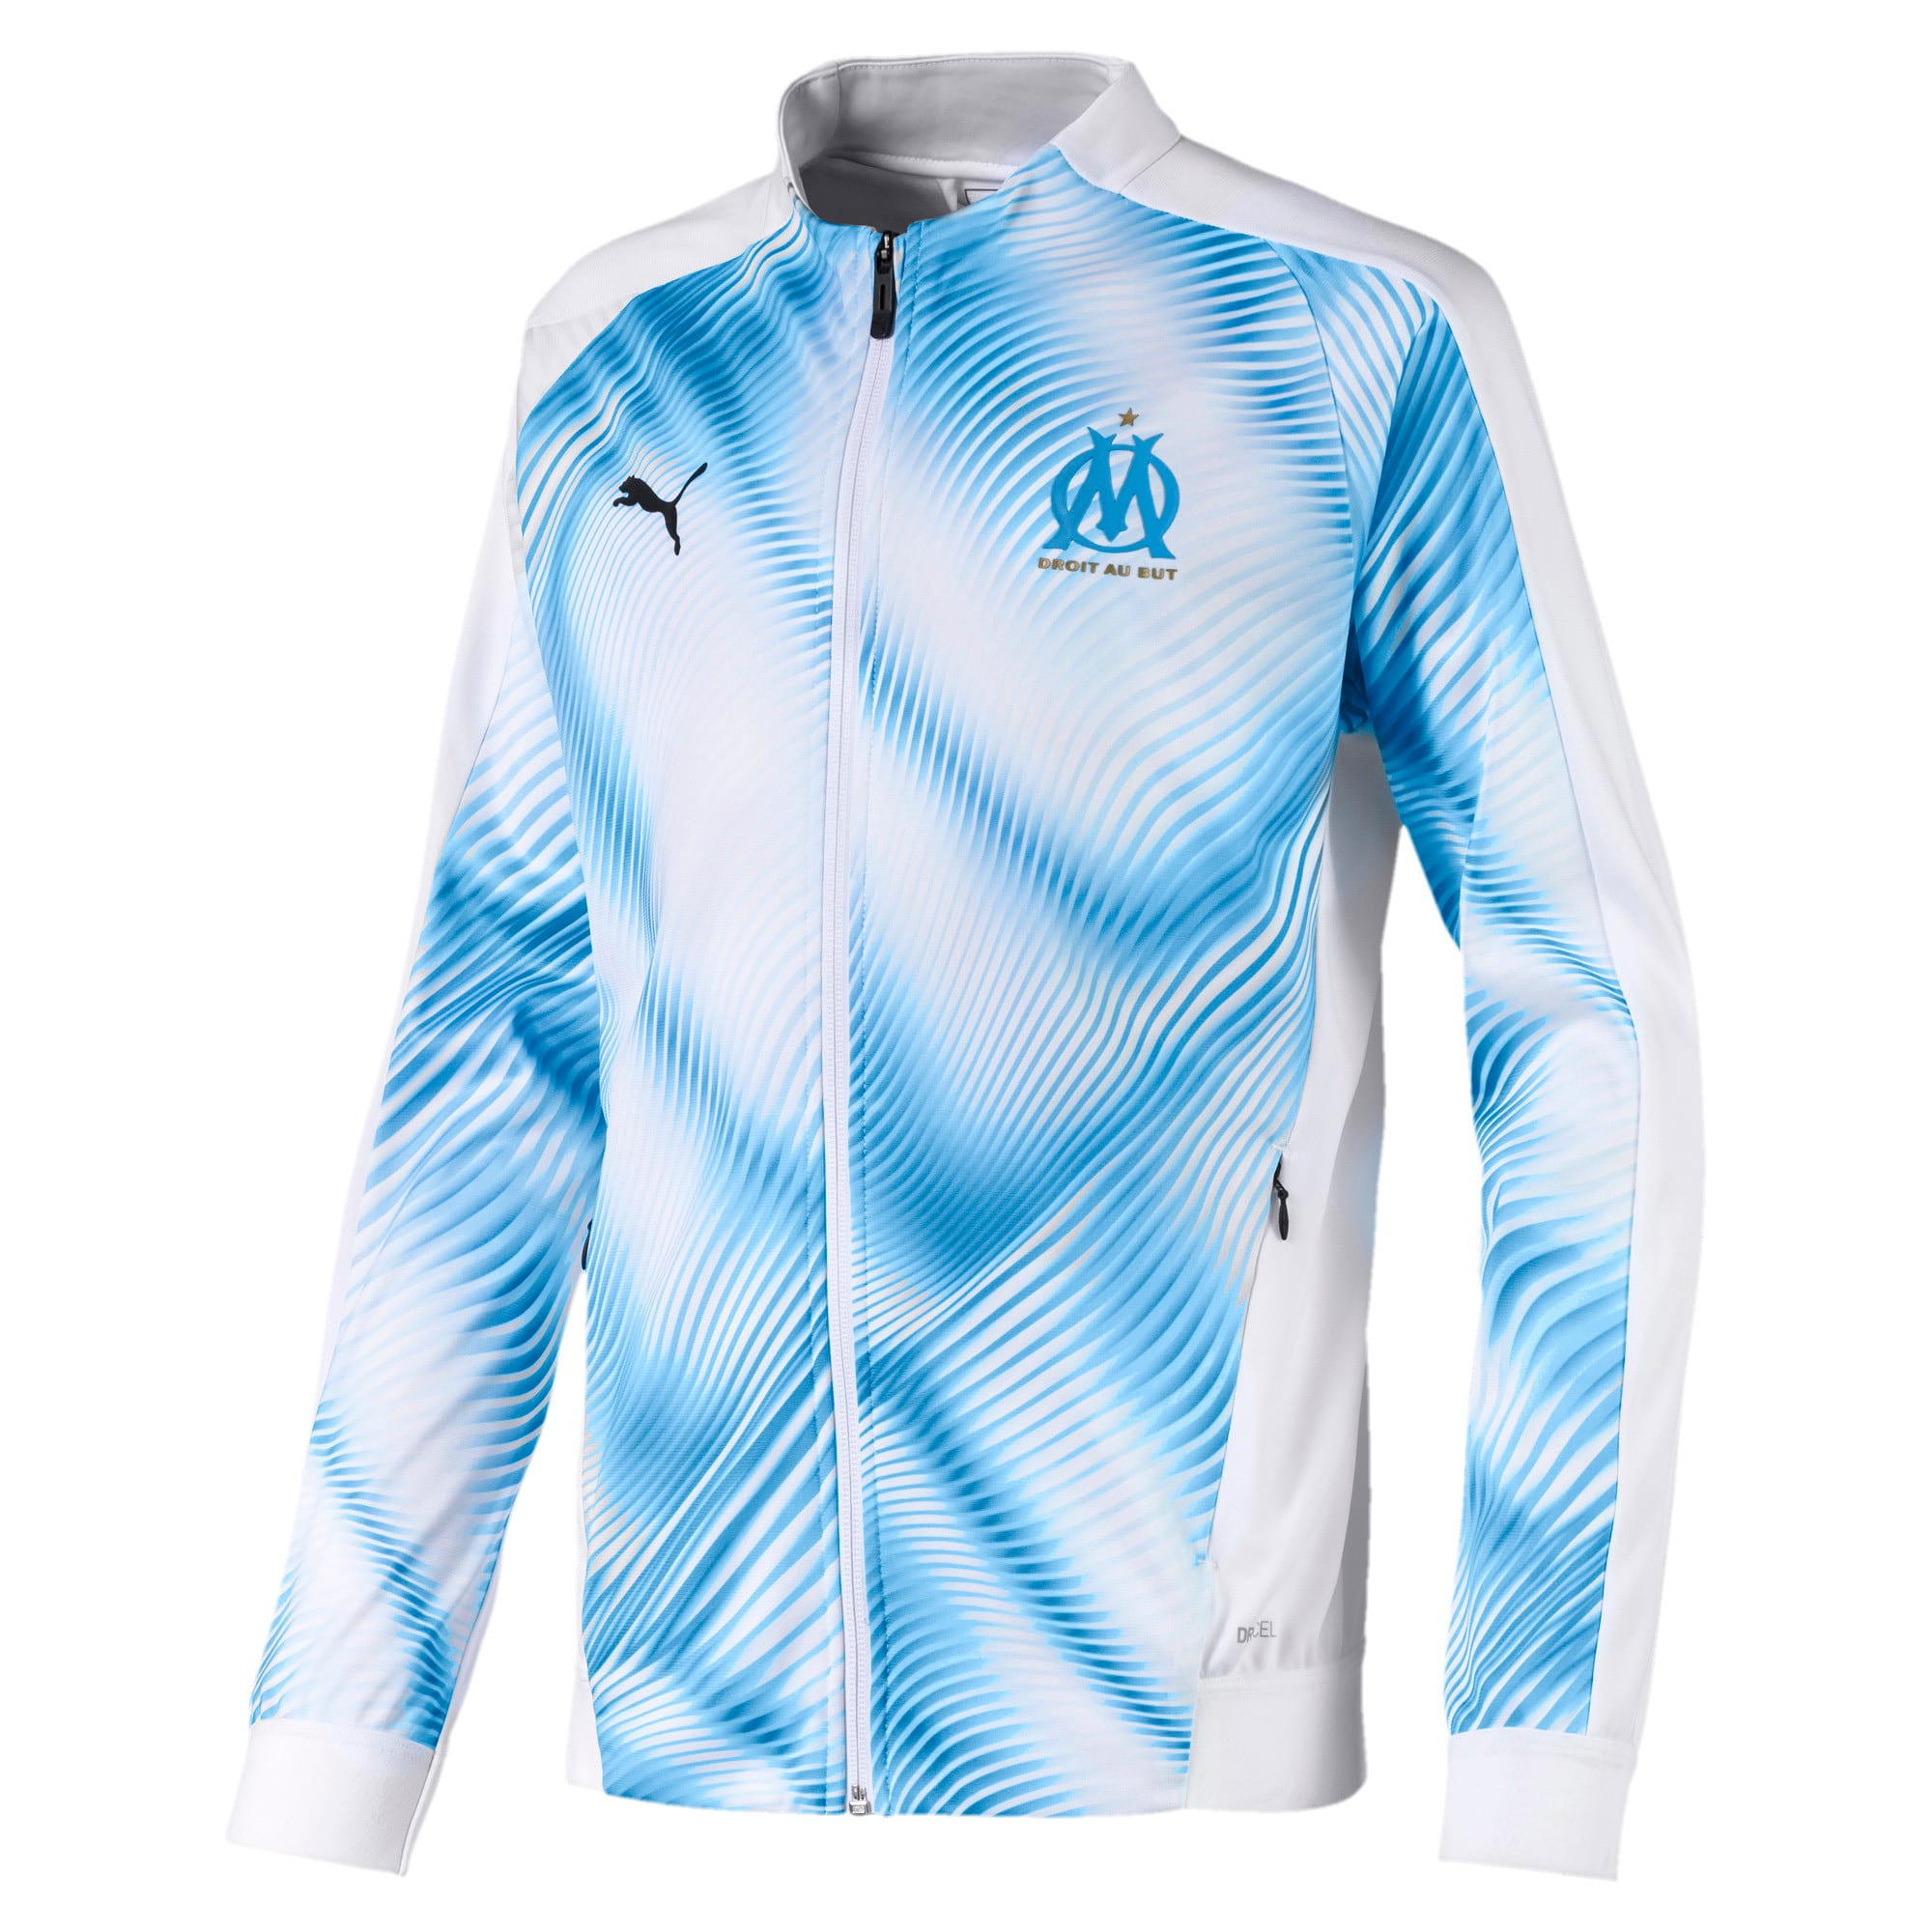 Olympique de Marseille Stadium Boys' Replica Jacket, Wit/Blauw, Maat 128   PUMA